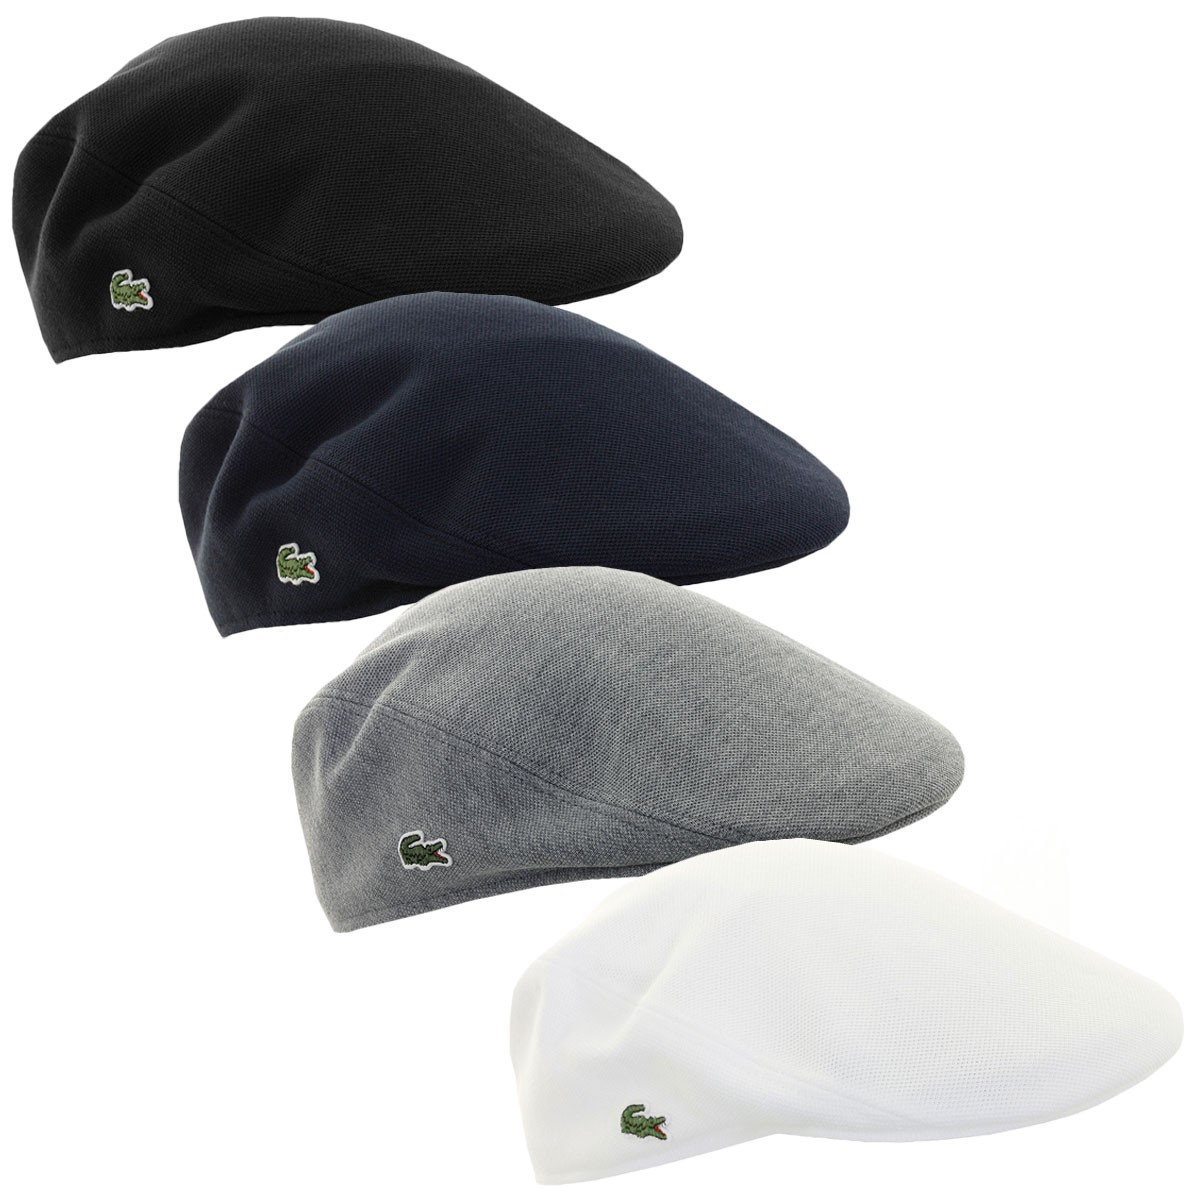 f18f341651d Lacoste Mens RK0345 Cotton Pique Flat Golf Cap